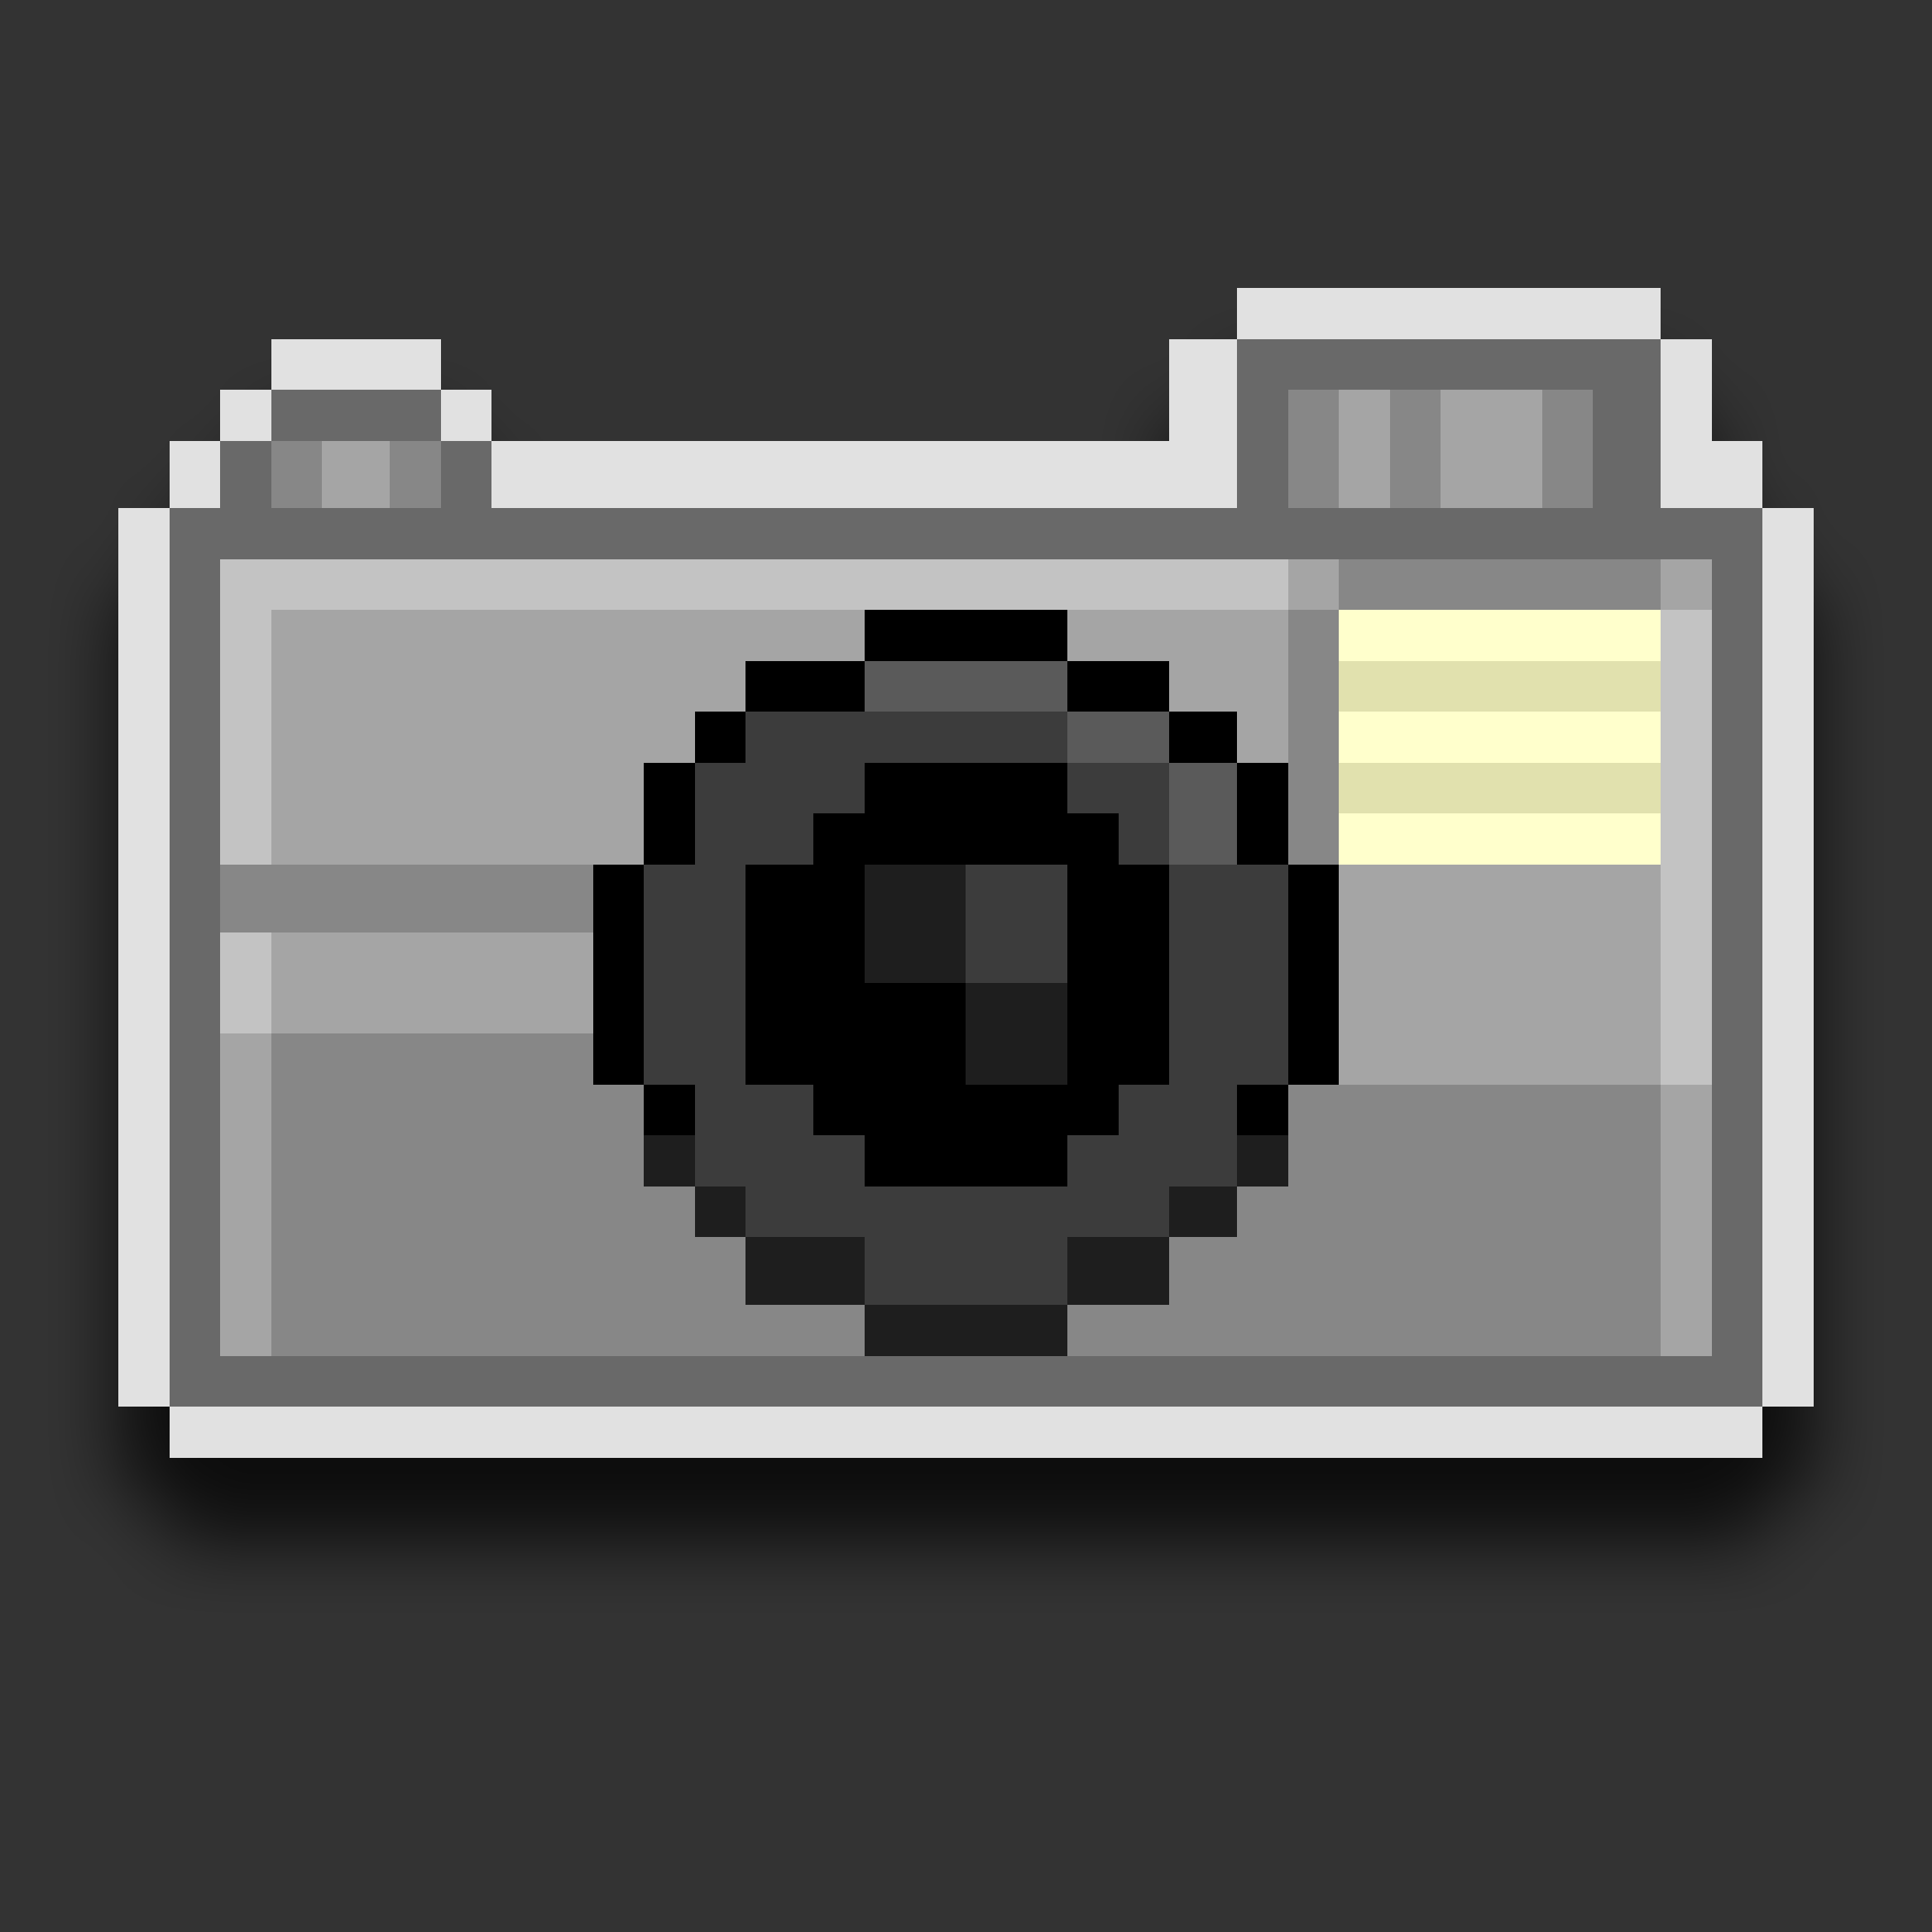 Pixel Art Backgrounds on Wallpapers Vista